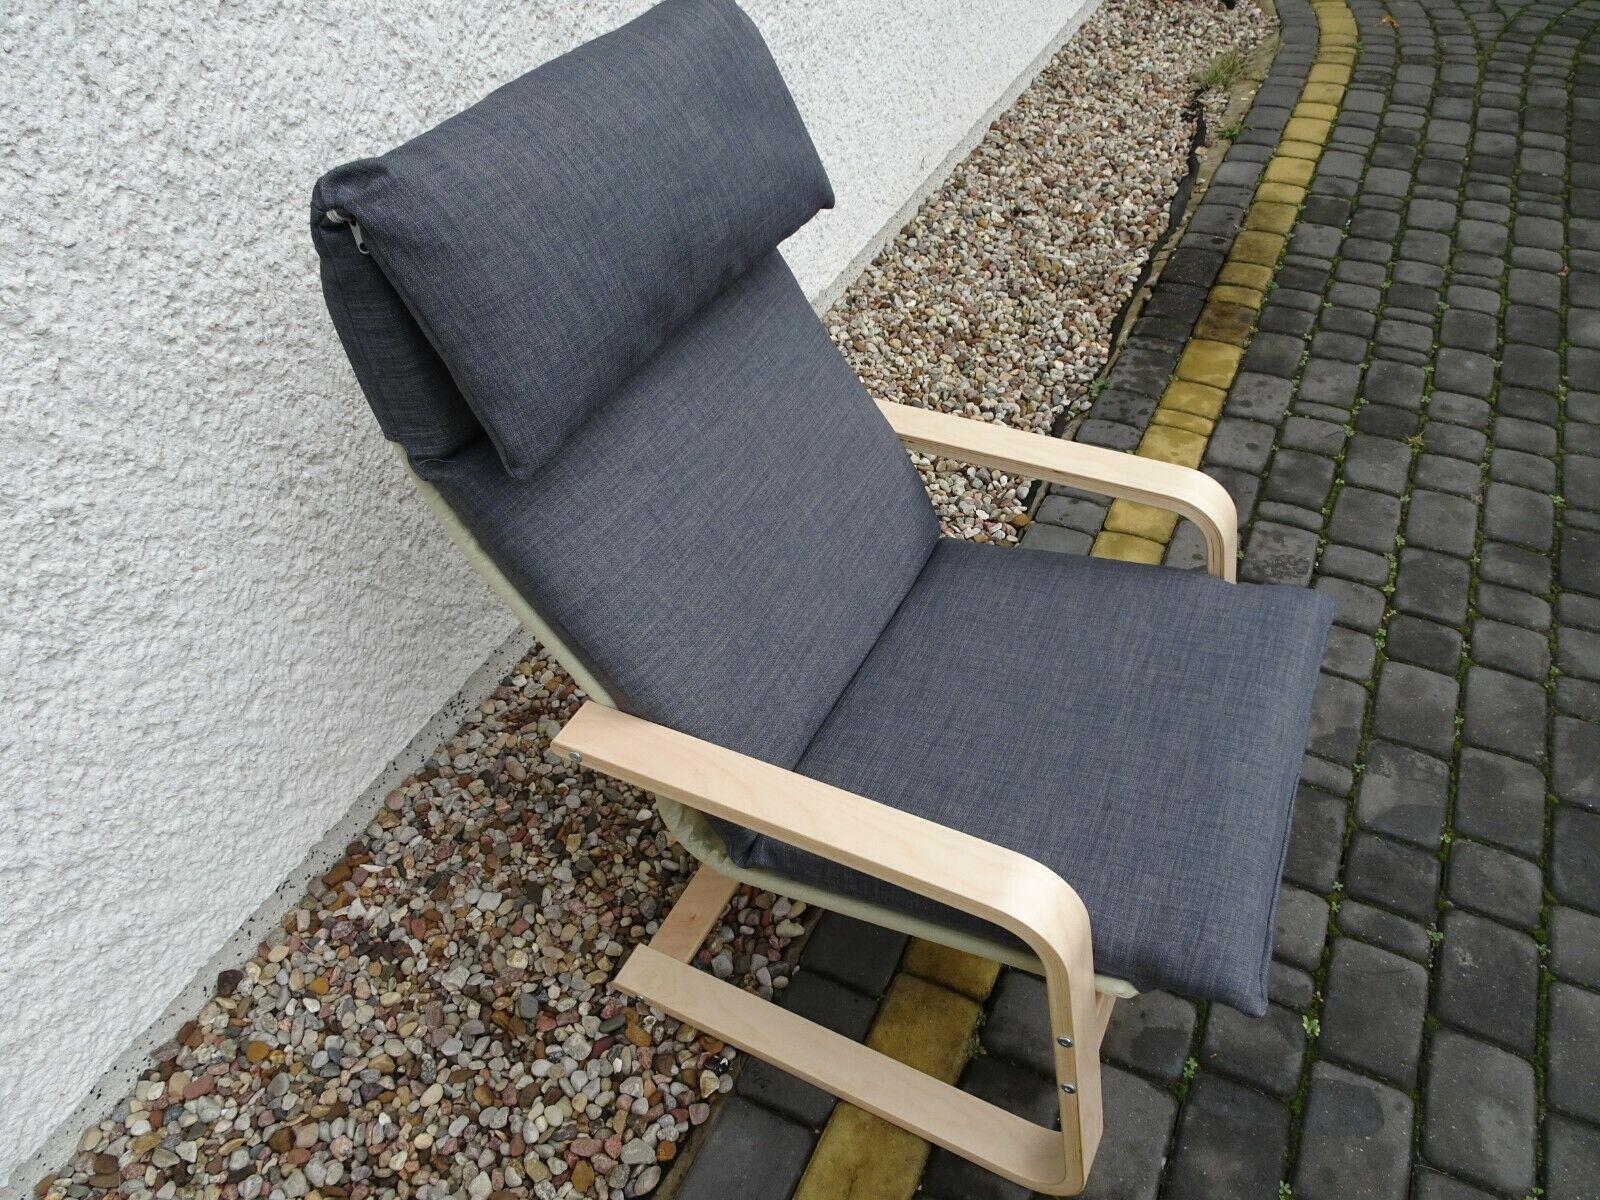 Full Size of Liegestuhl Ikea Pong Pello Polsterkissen Fr Sessel Betten 160x200 Garten Küche Kaufen Miniküche Kosten Bei Sofa Mit Schlaffunktion Modulküche Wohnzimmer Liegestuhl Ikea